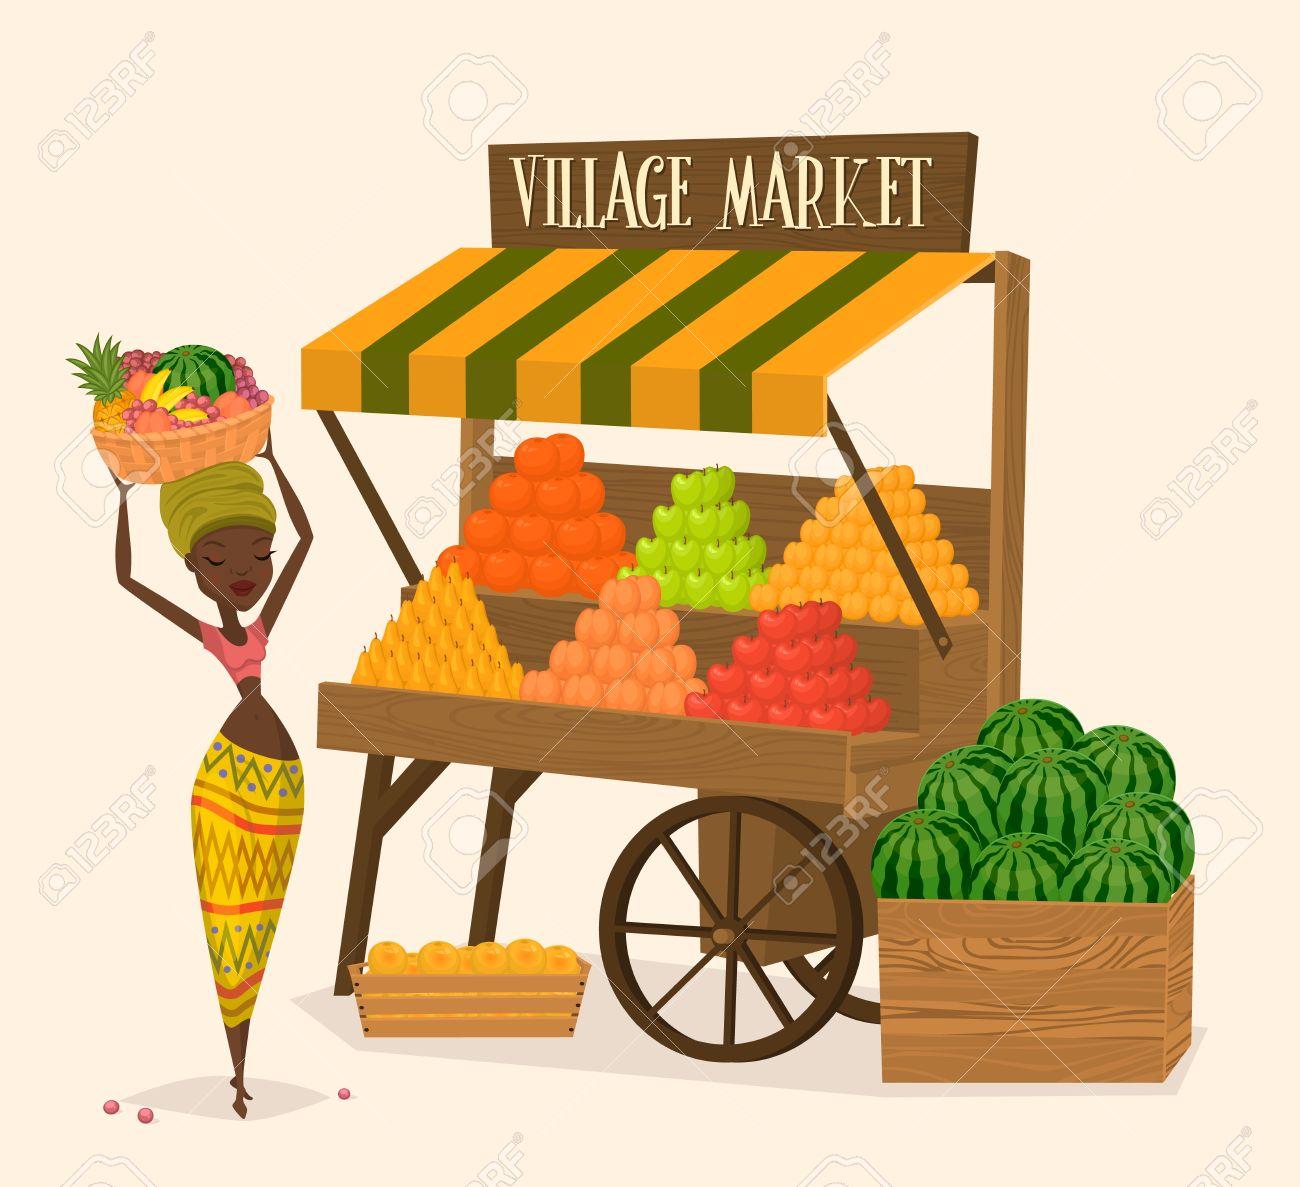 local farmer shopkeeper seller fresh vegetables farmers market rh 123rf com farmers market clipart images Farmers Market Signs